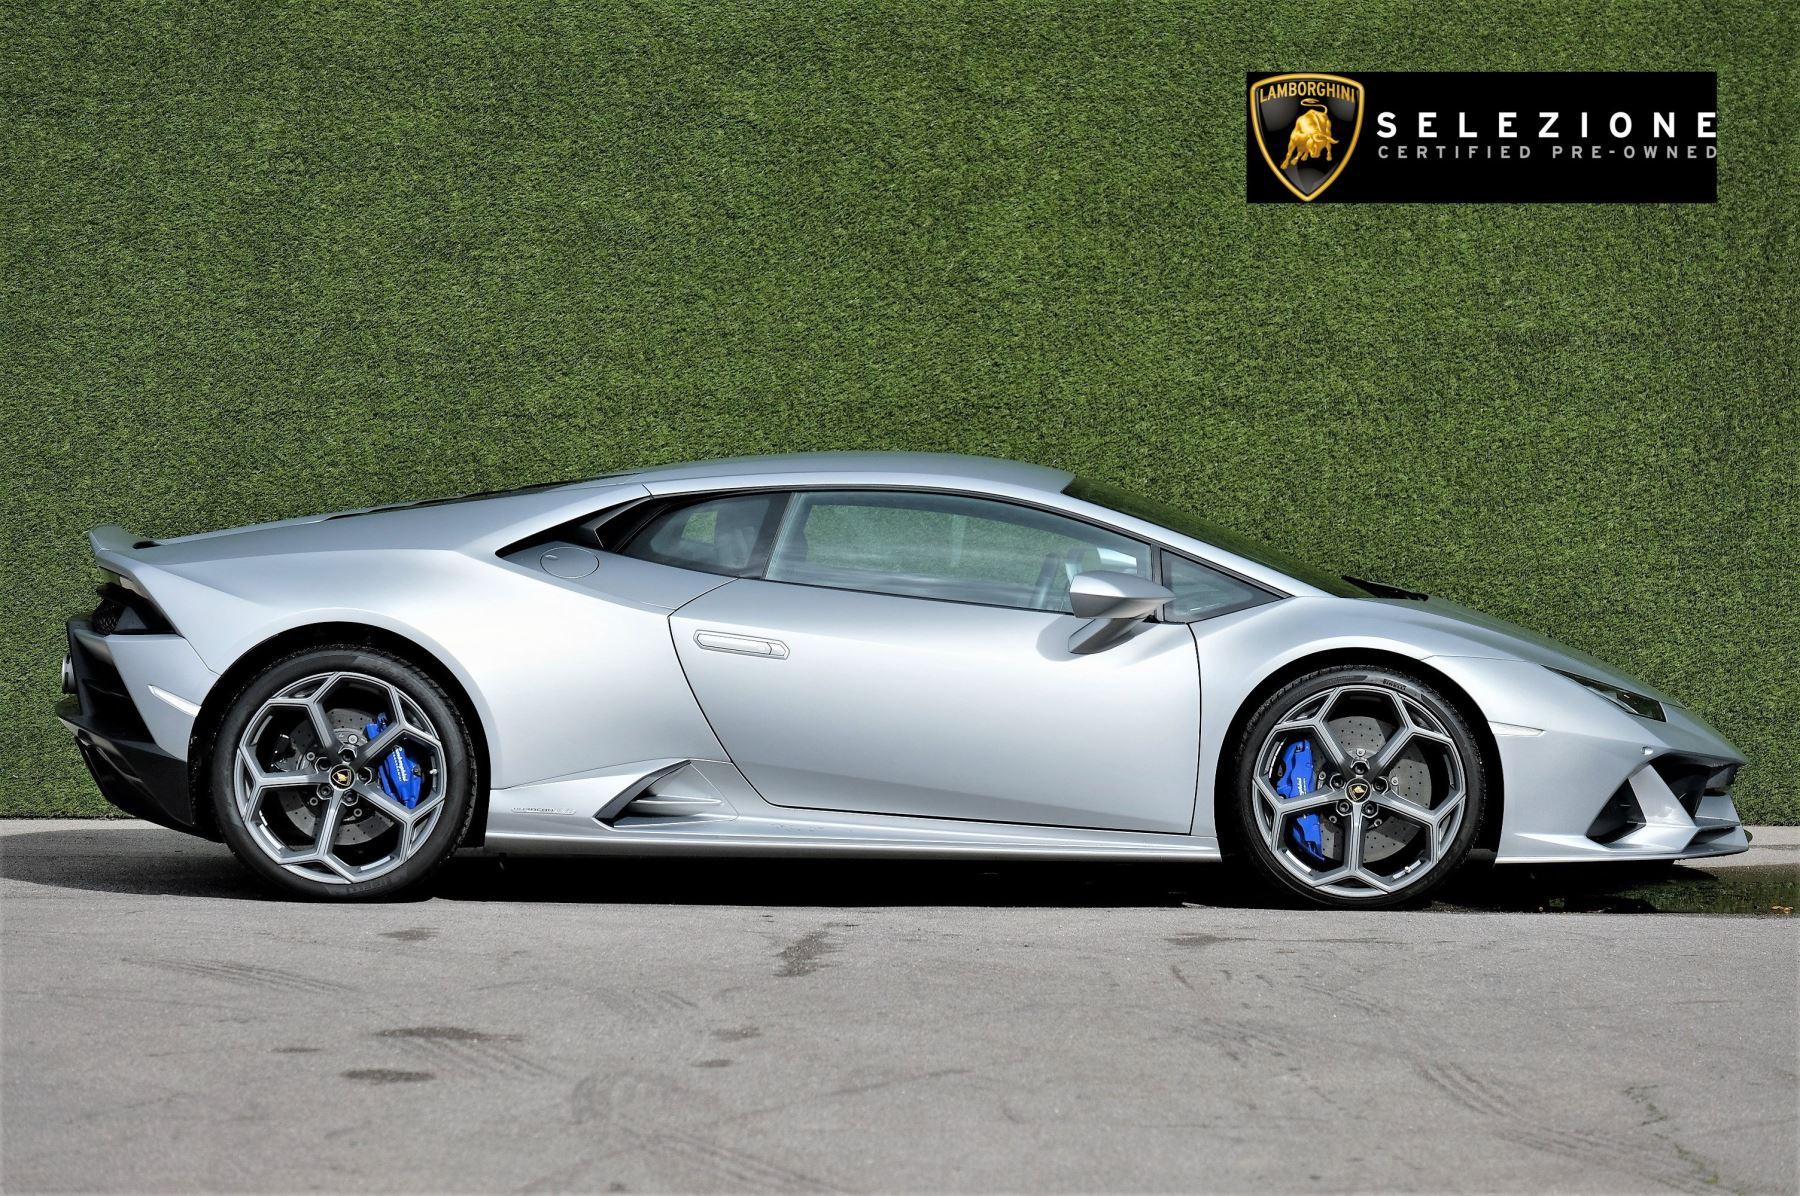 Lamborghini Huracan EVO LP 640-4 5.2 image 2